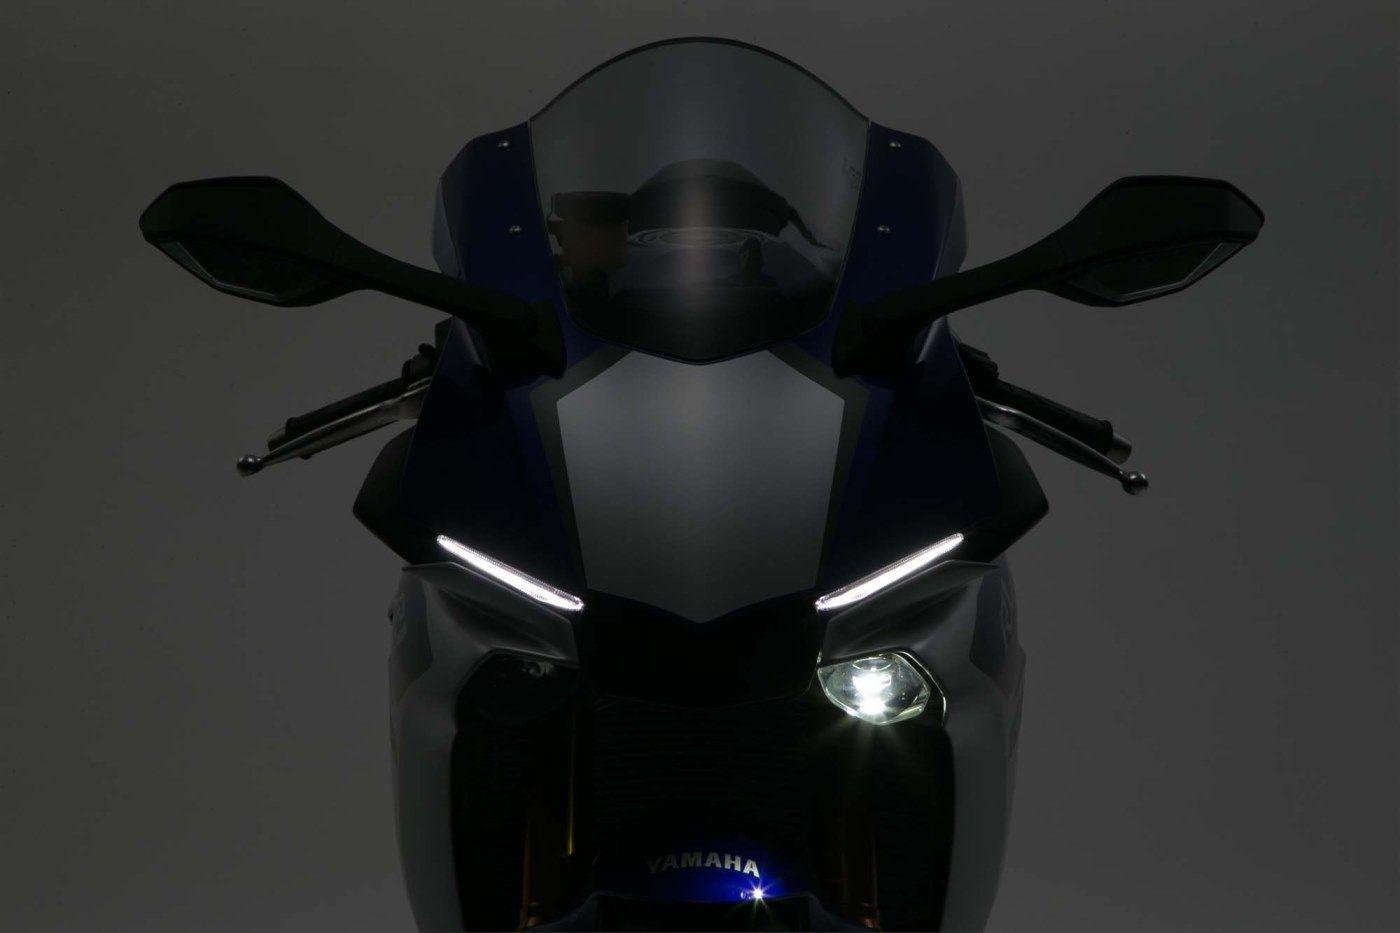 Yamaha R1 Black Wallpapers Top Free Yamaha R1 Black Backgrounds